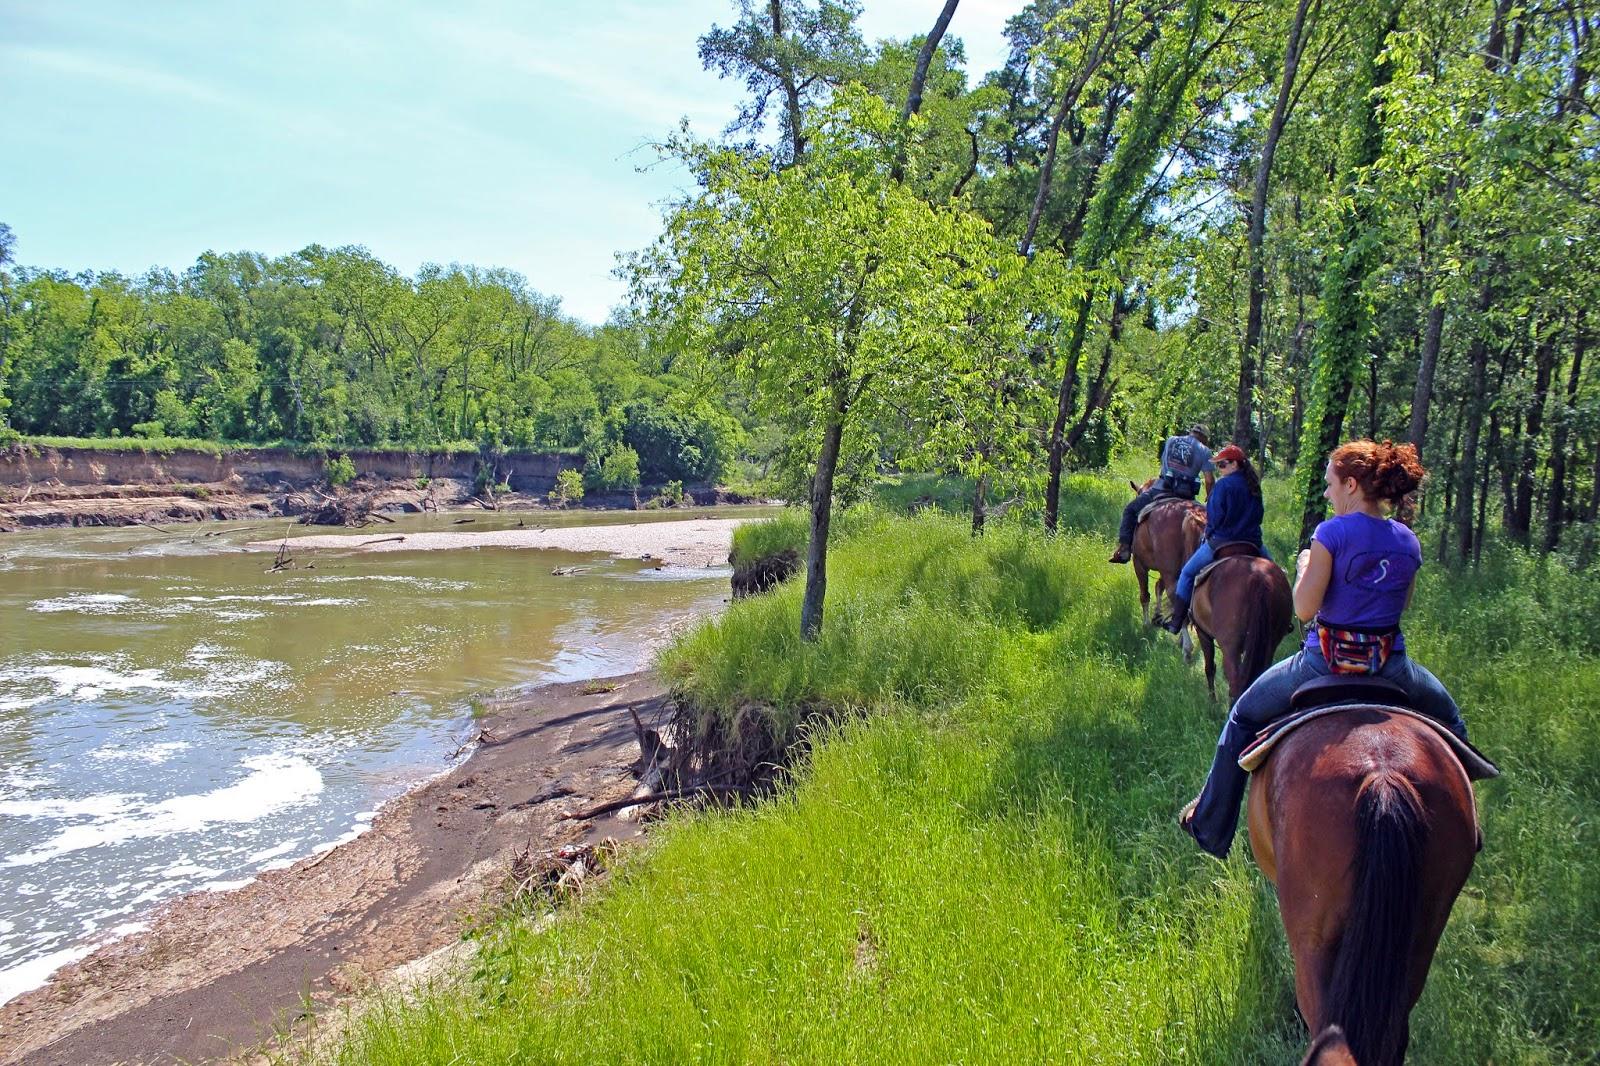 Dallas Trinity Trails: Horseback Riding The Trinity River